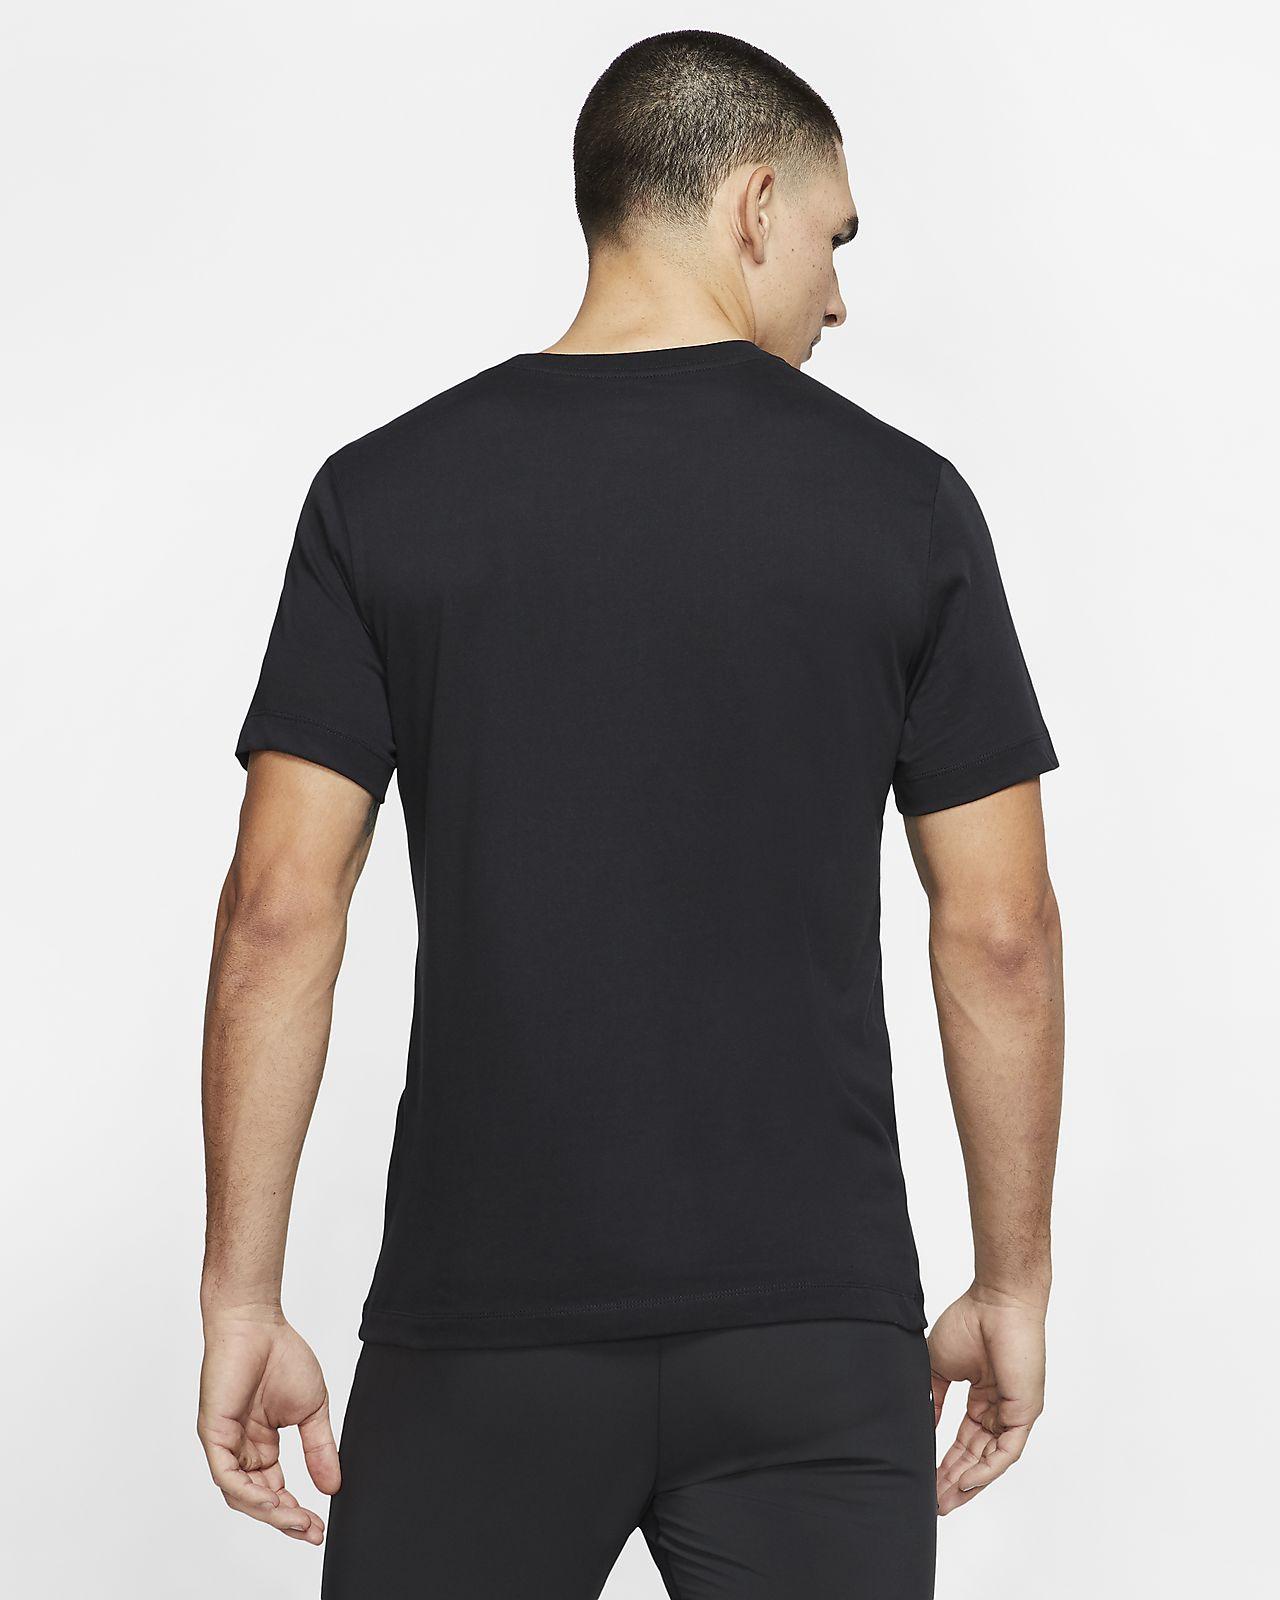 Nike Dri FIT løbe T shirt til mænd